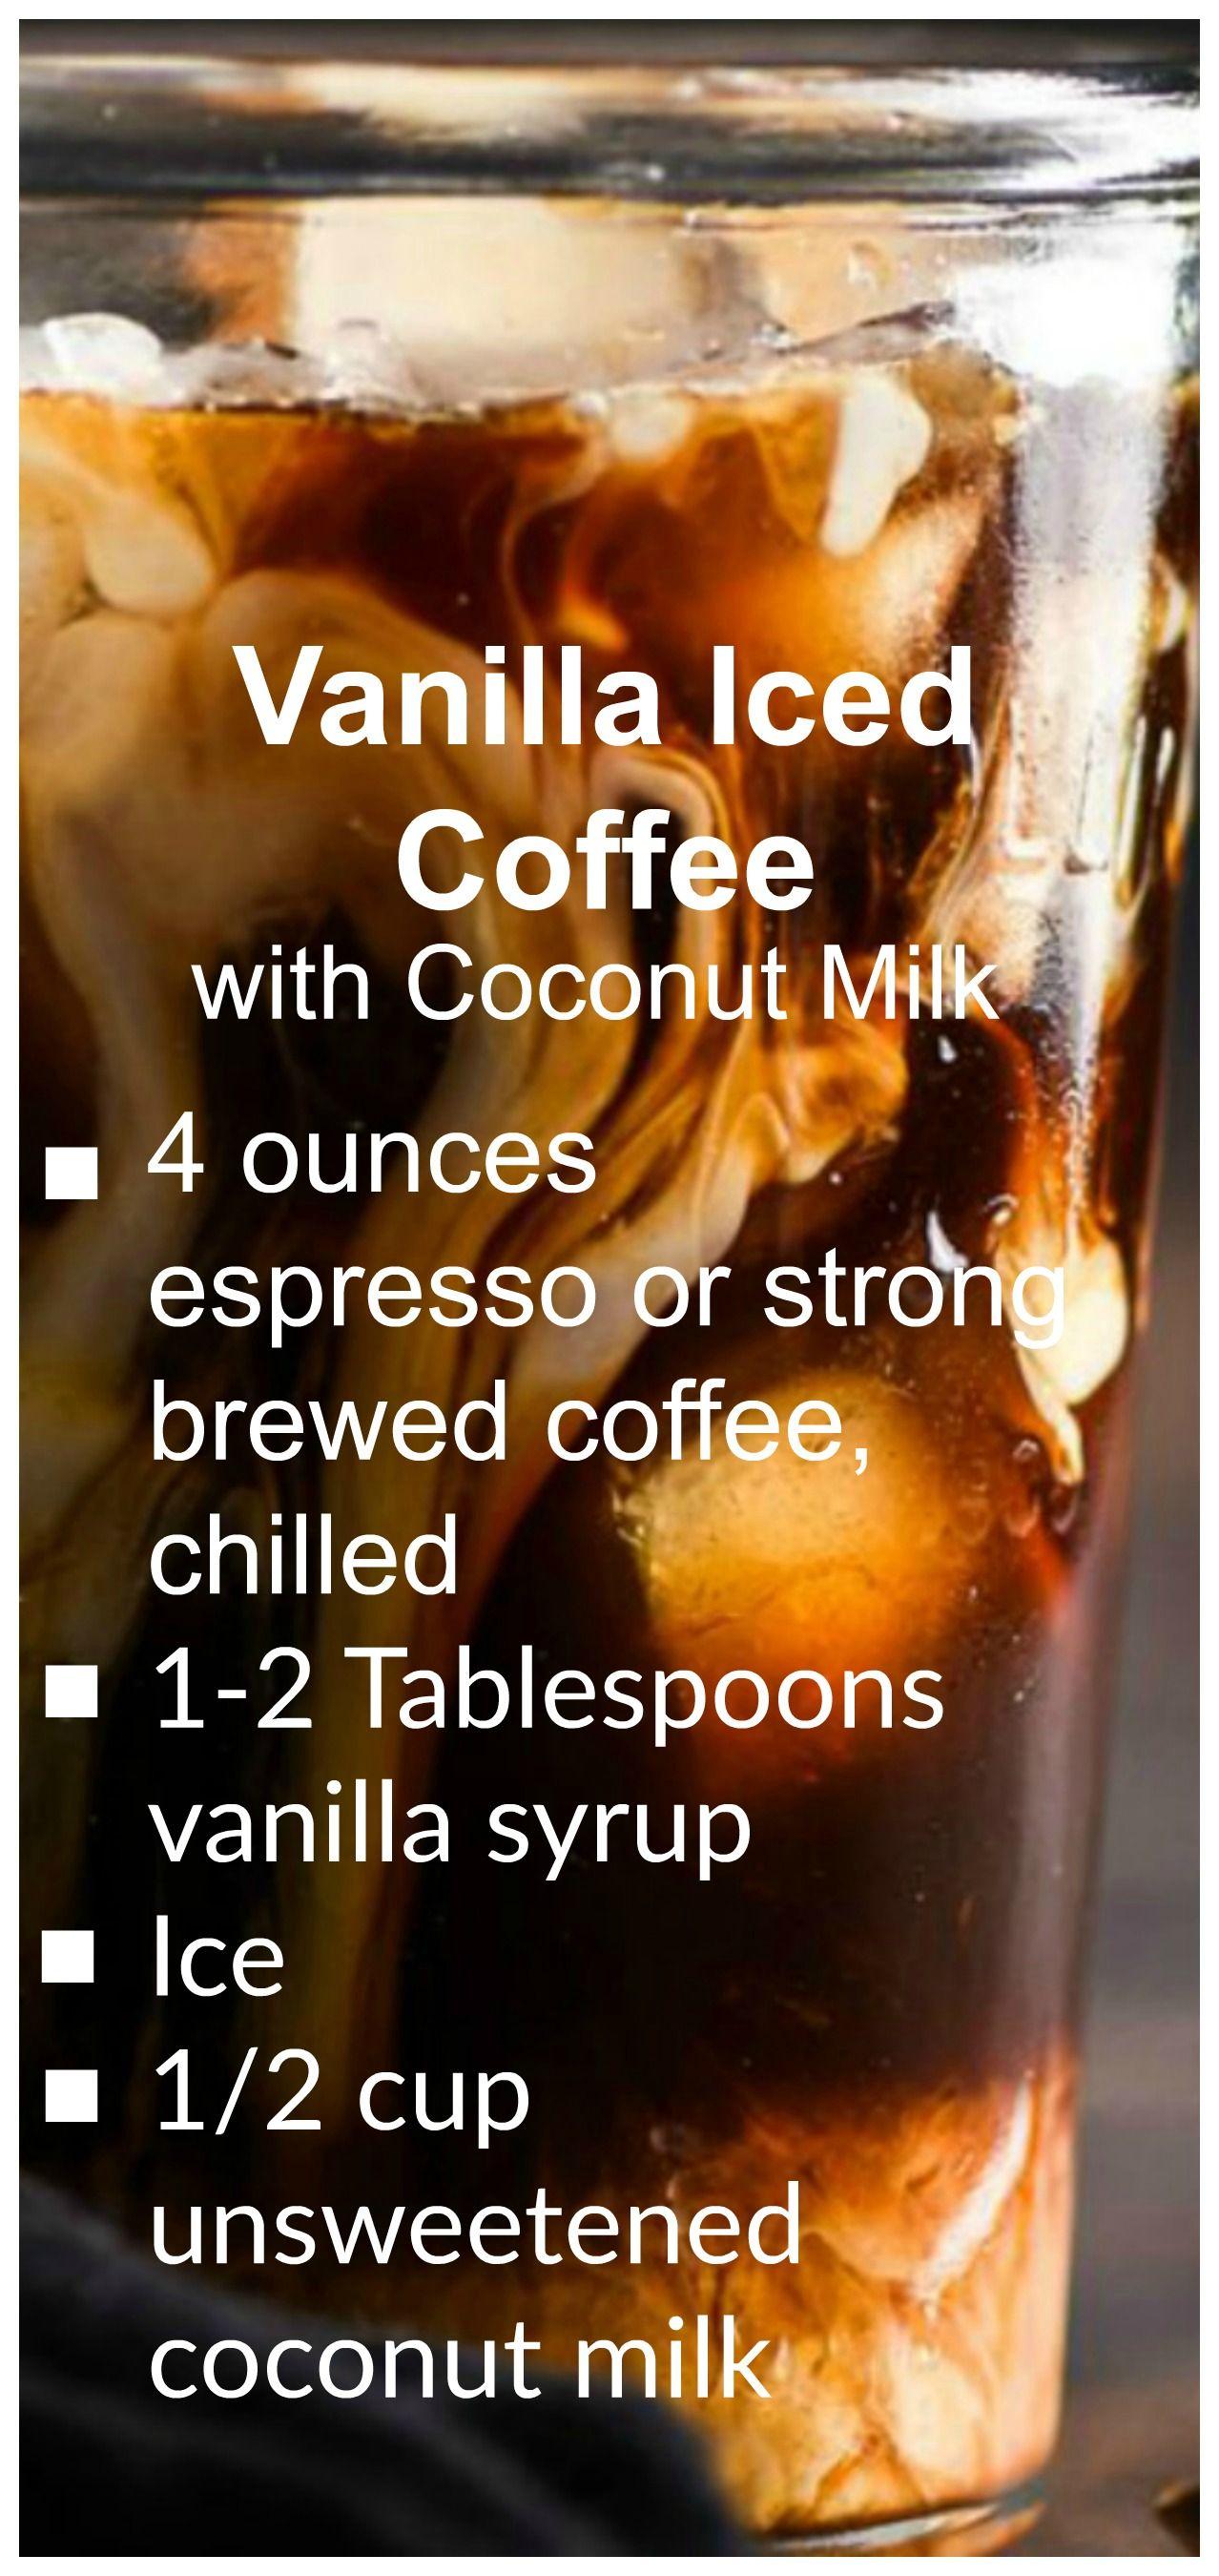 Homemade Vanilla Iced Coffee